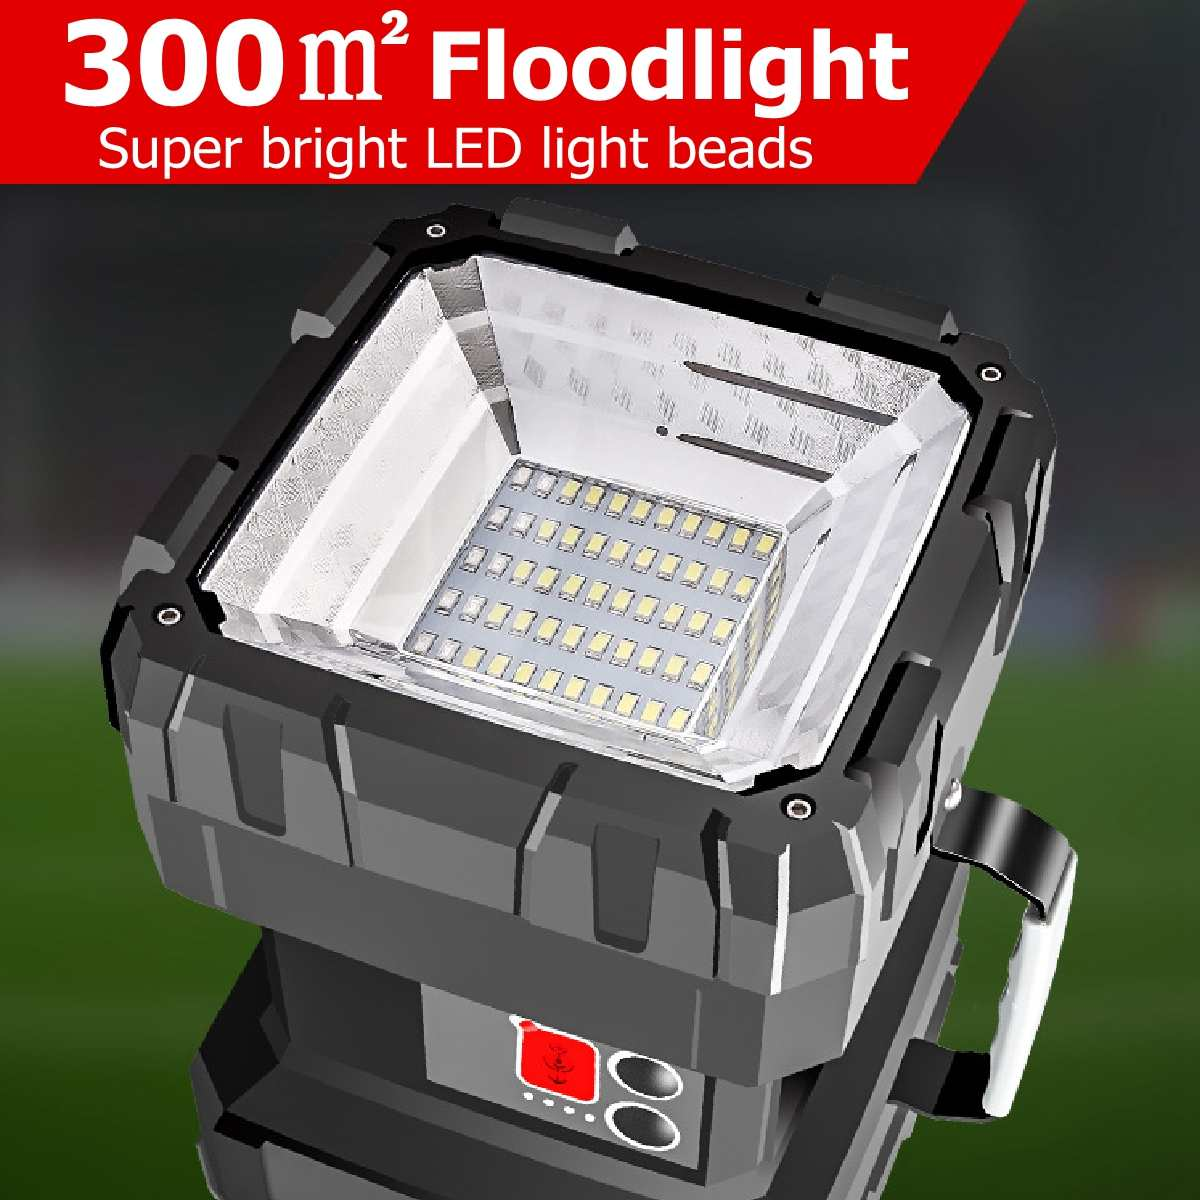 Cabeza de LED lámpara lámpara lámpara rectos Lámpara Linterna cabeza lámpara de plástico